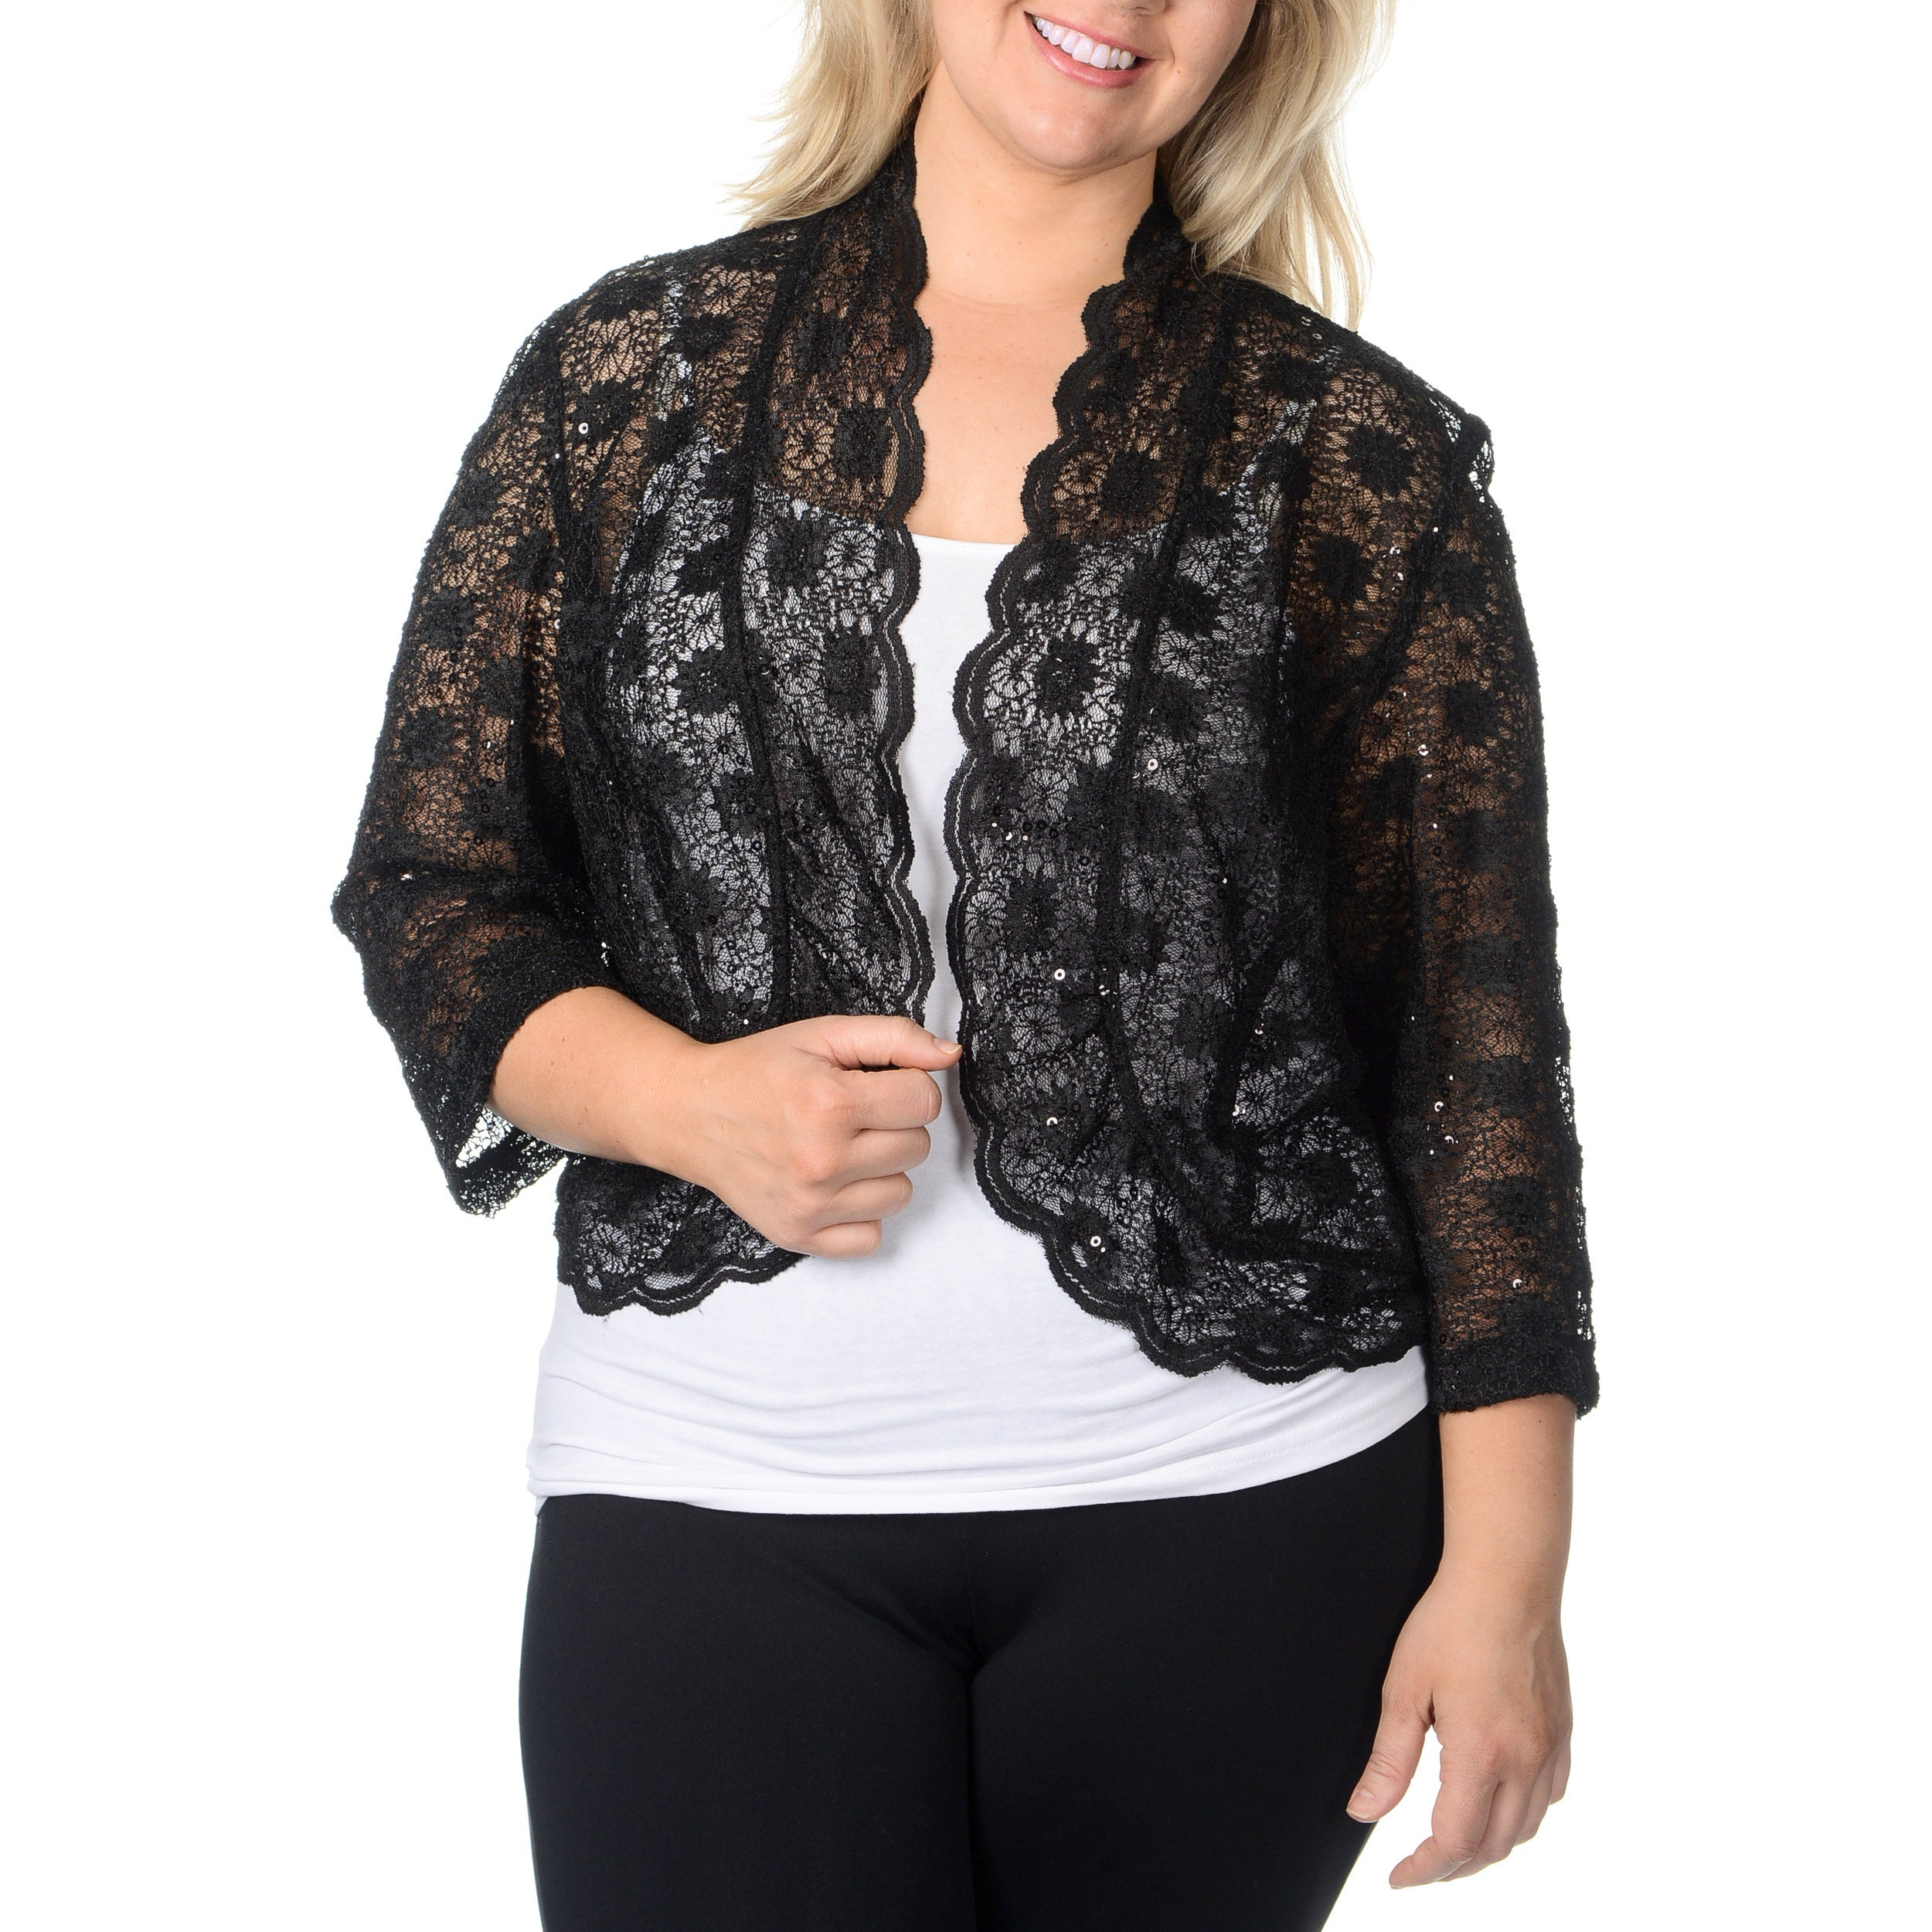 R & M Richards Women's Plus Size Black Lace Shrug at Sears.com